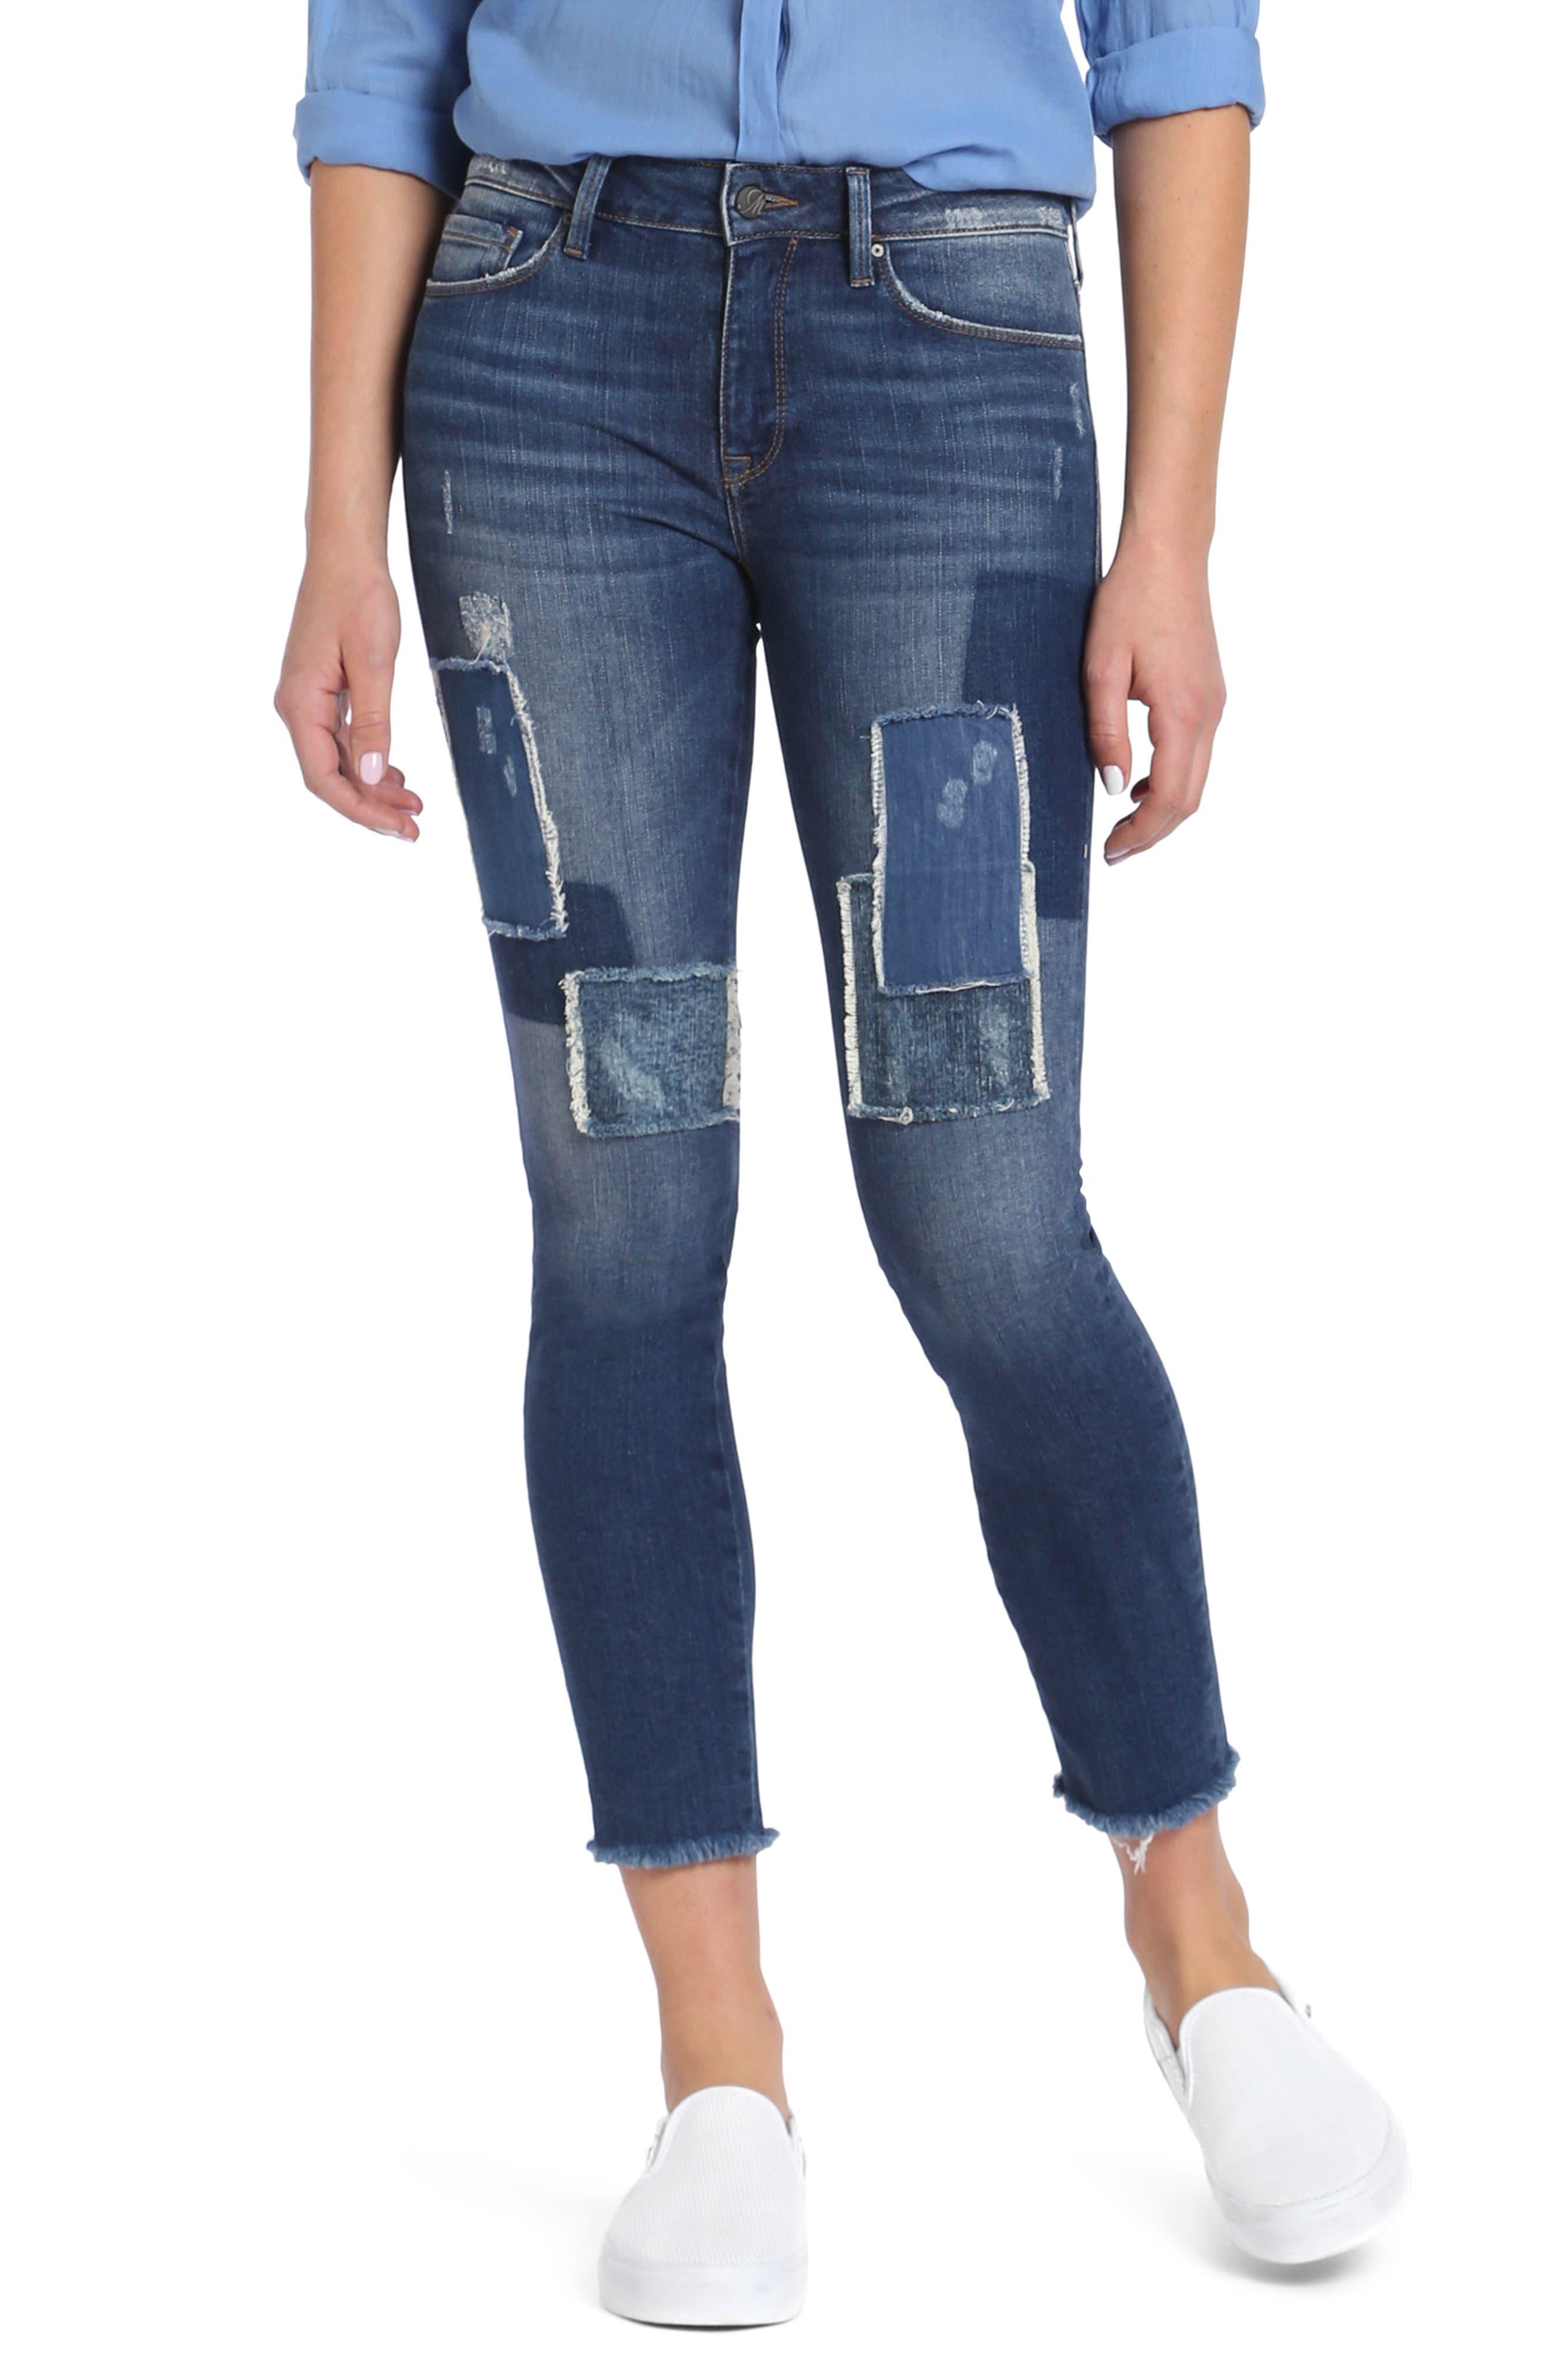 Main Image - Mavi Jeans Adriana Patched Stretch Skinny Jeans (Indigo Patched Vintage)